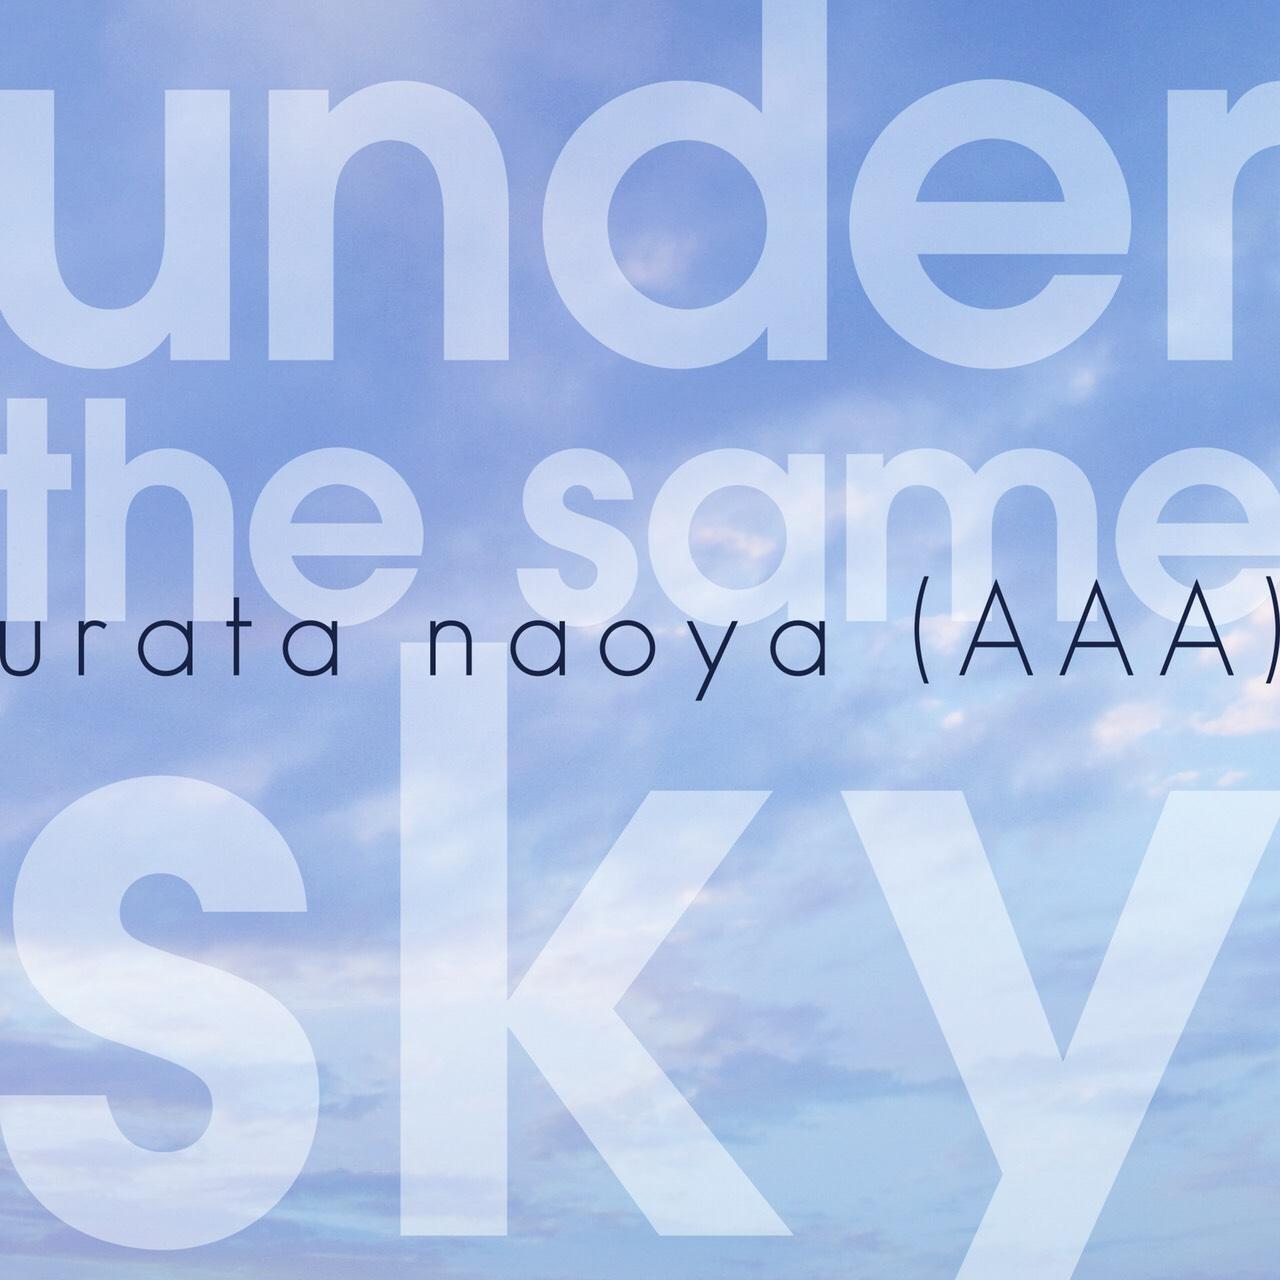 urata naoya (AAA) 話題の新曲「under the same sky」配信スタートでコメント到着サムネイル画像